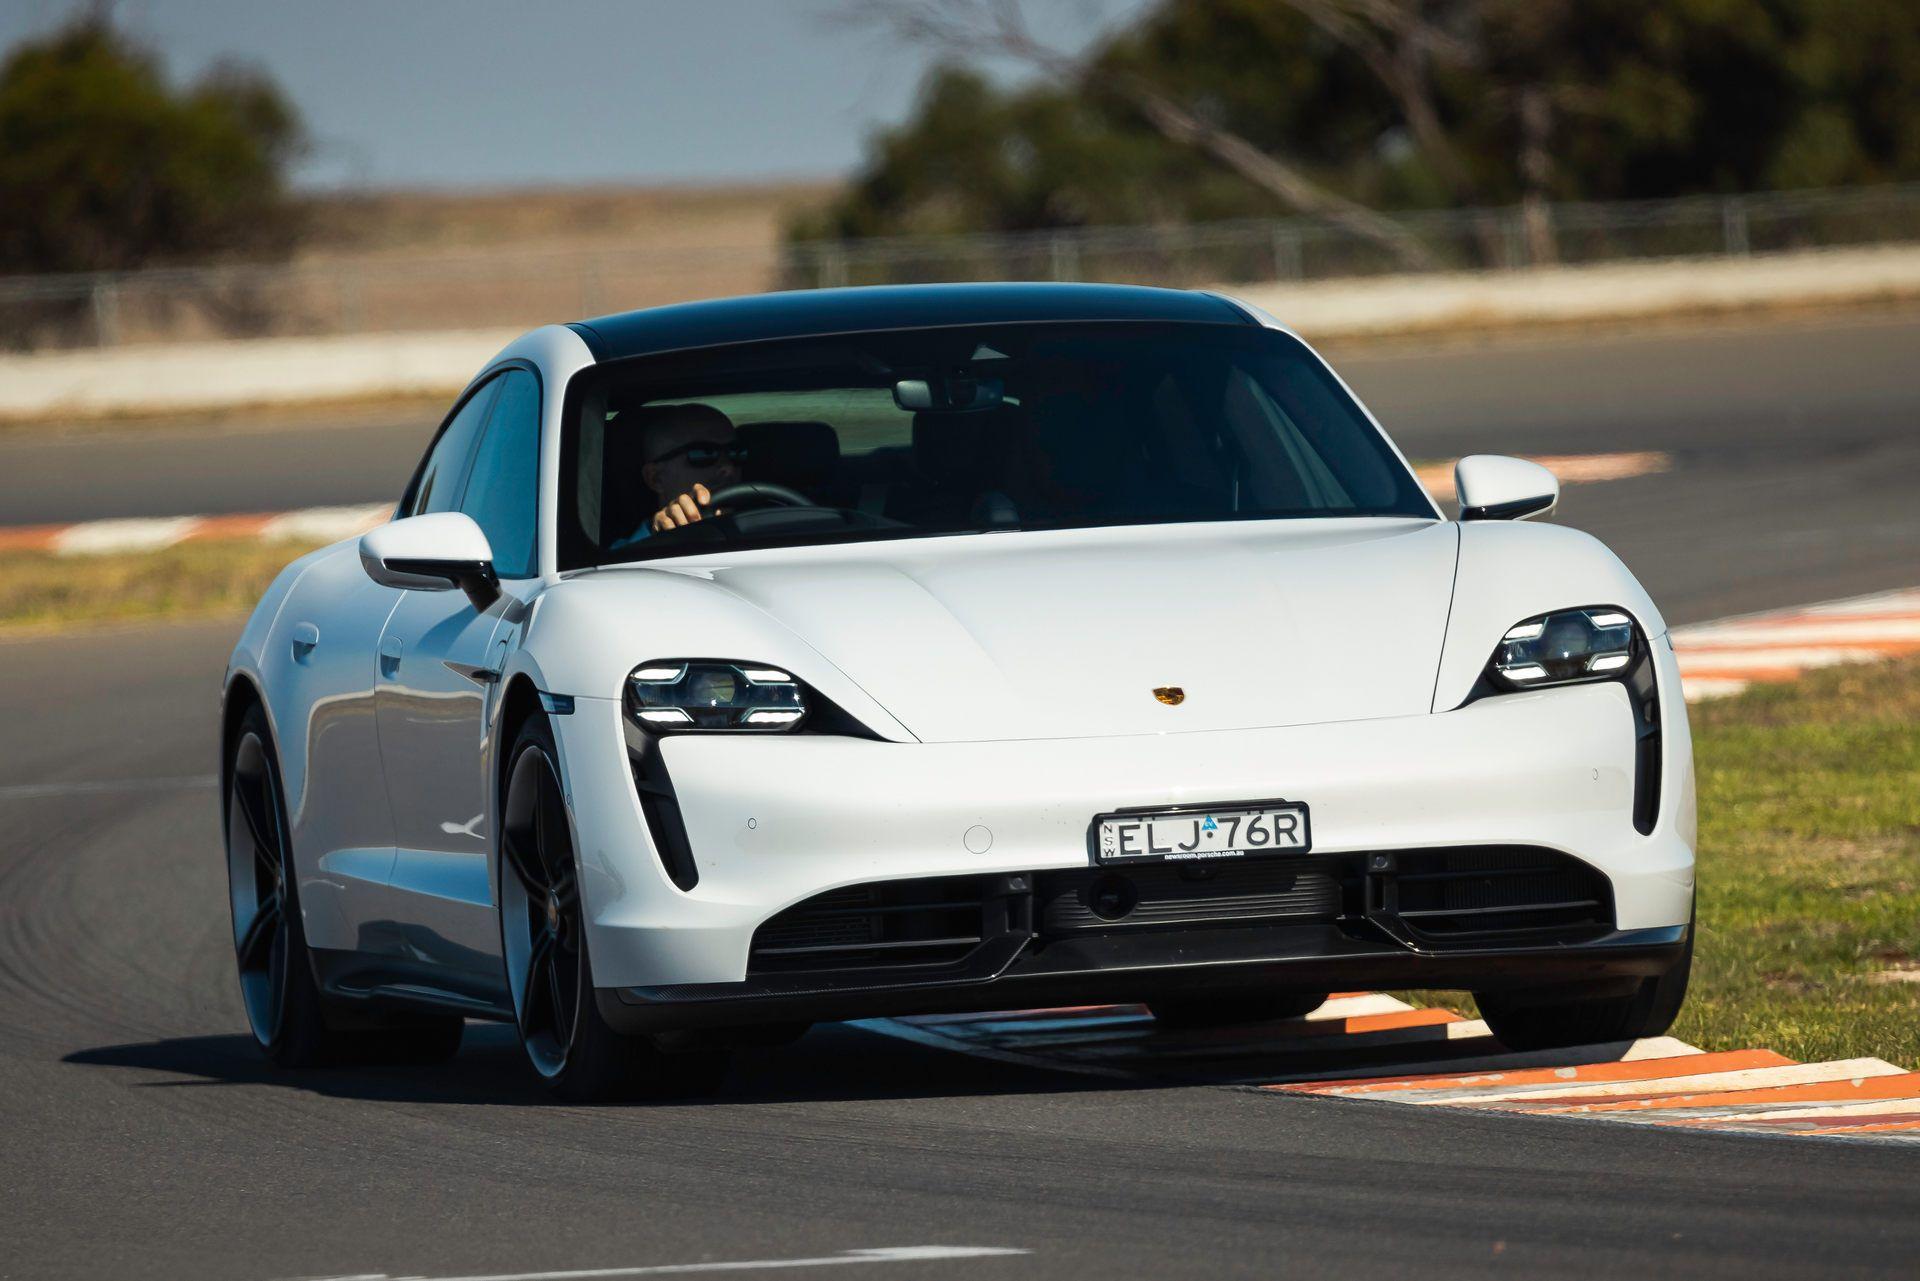 Porsche-Taycan-Turbo-S-The-Bend-Motorsport-Park-32